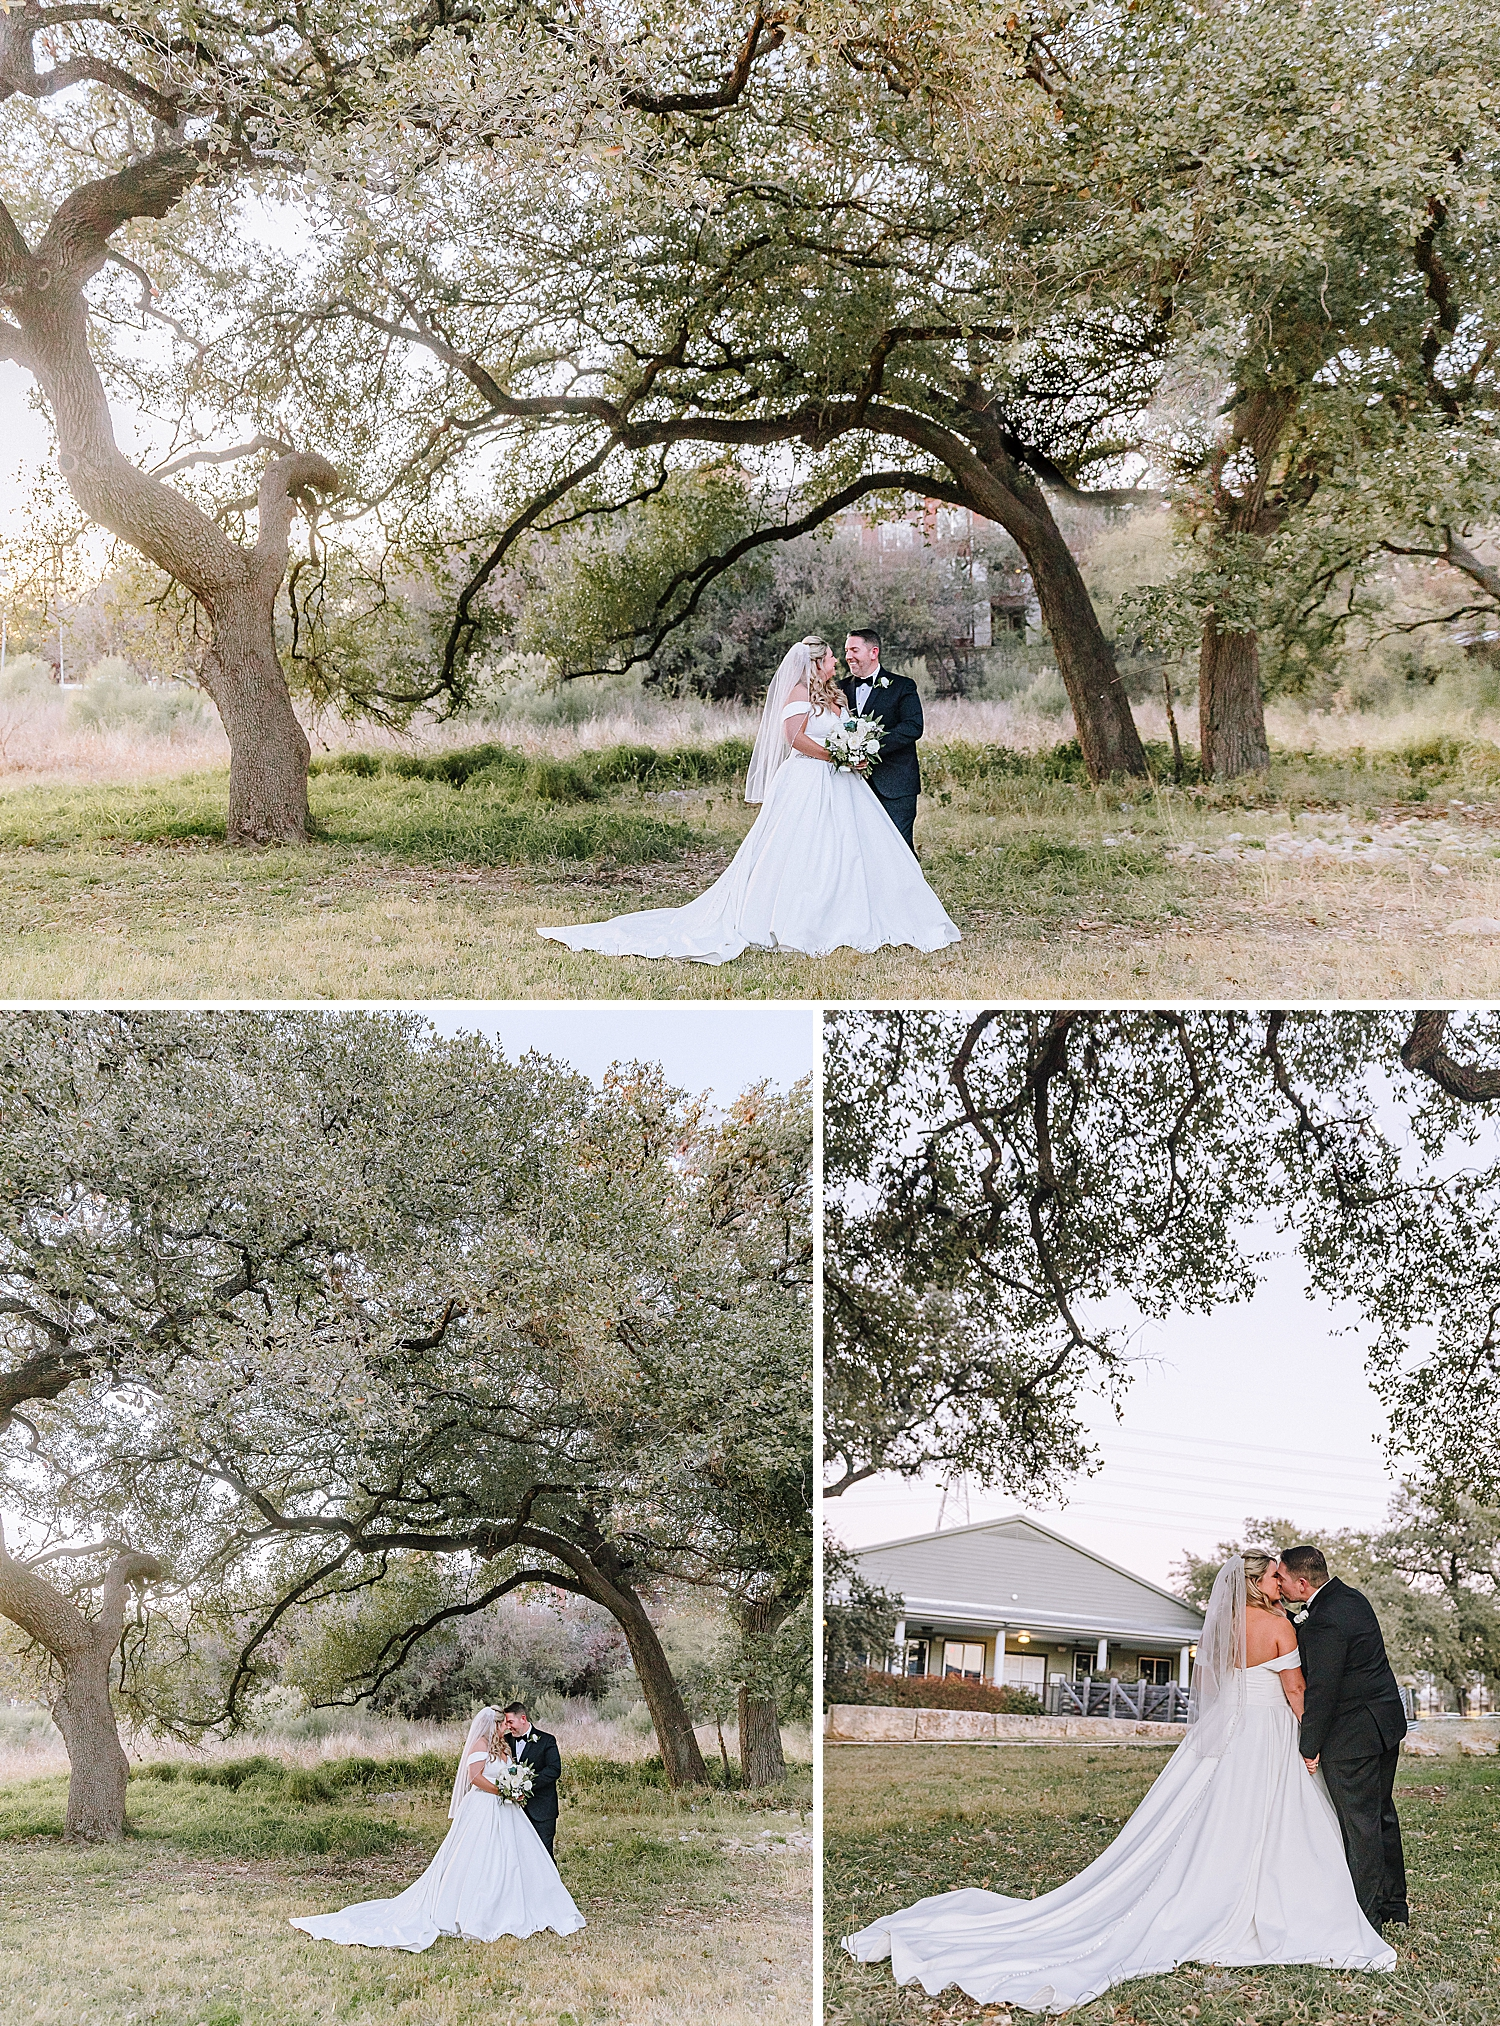 Magnolia-Halle-Wedding-San-Antonio-Texas-Bride-Grom_0071.jpg